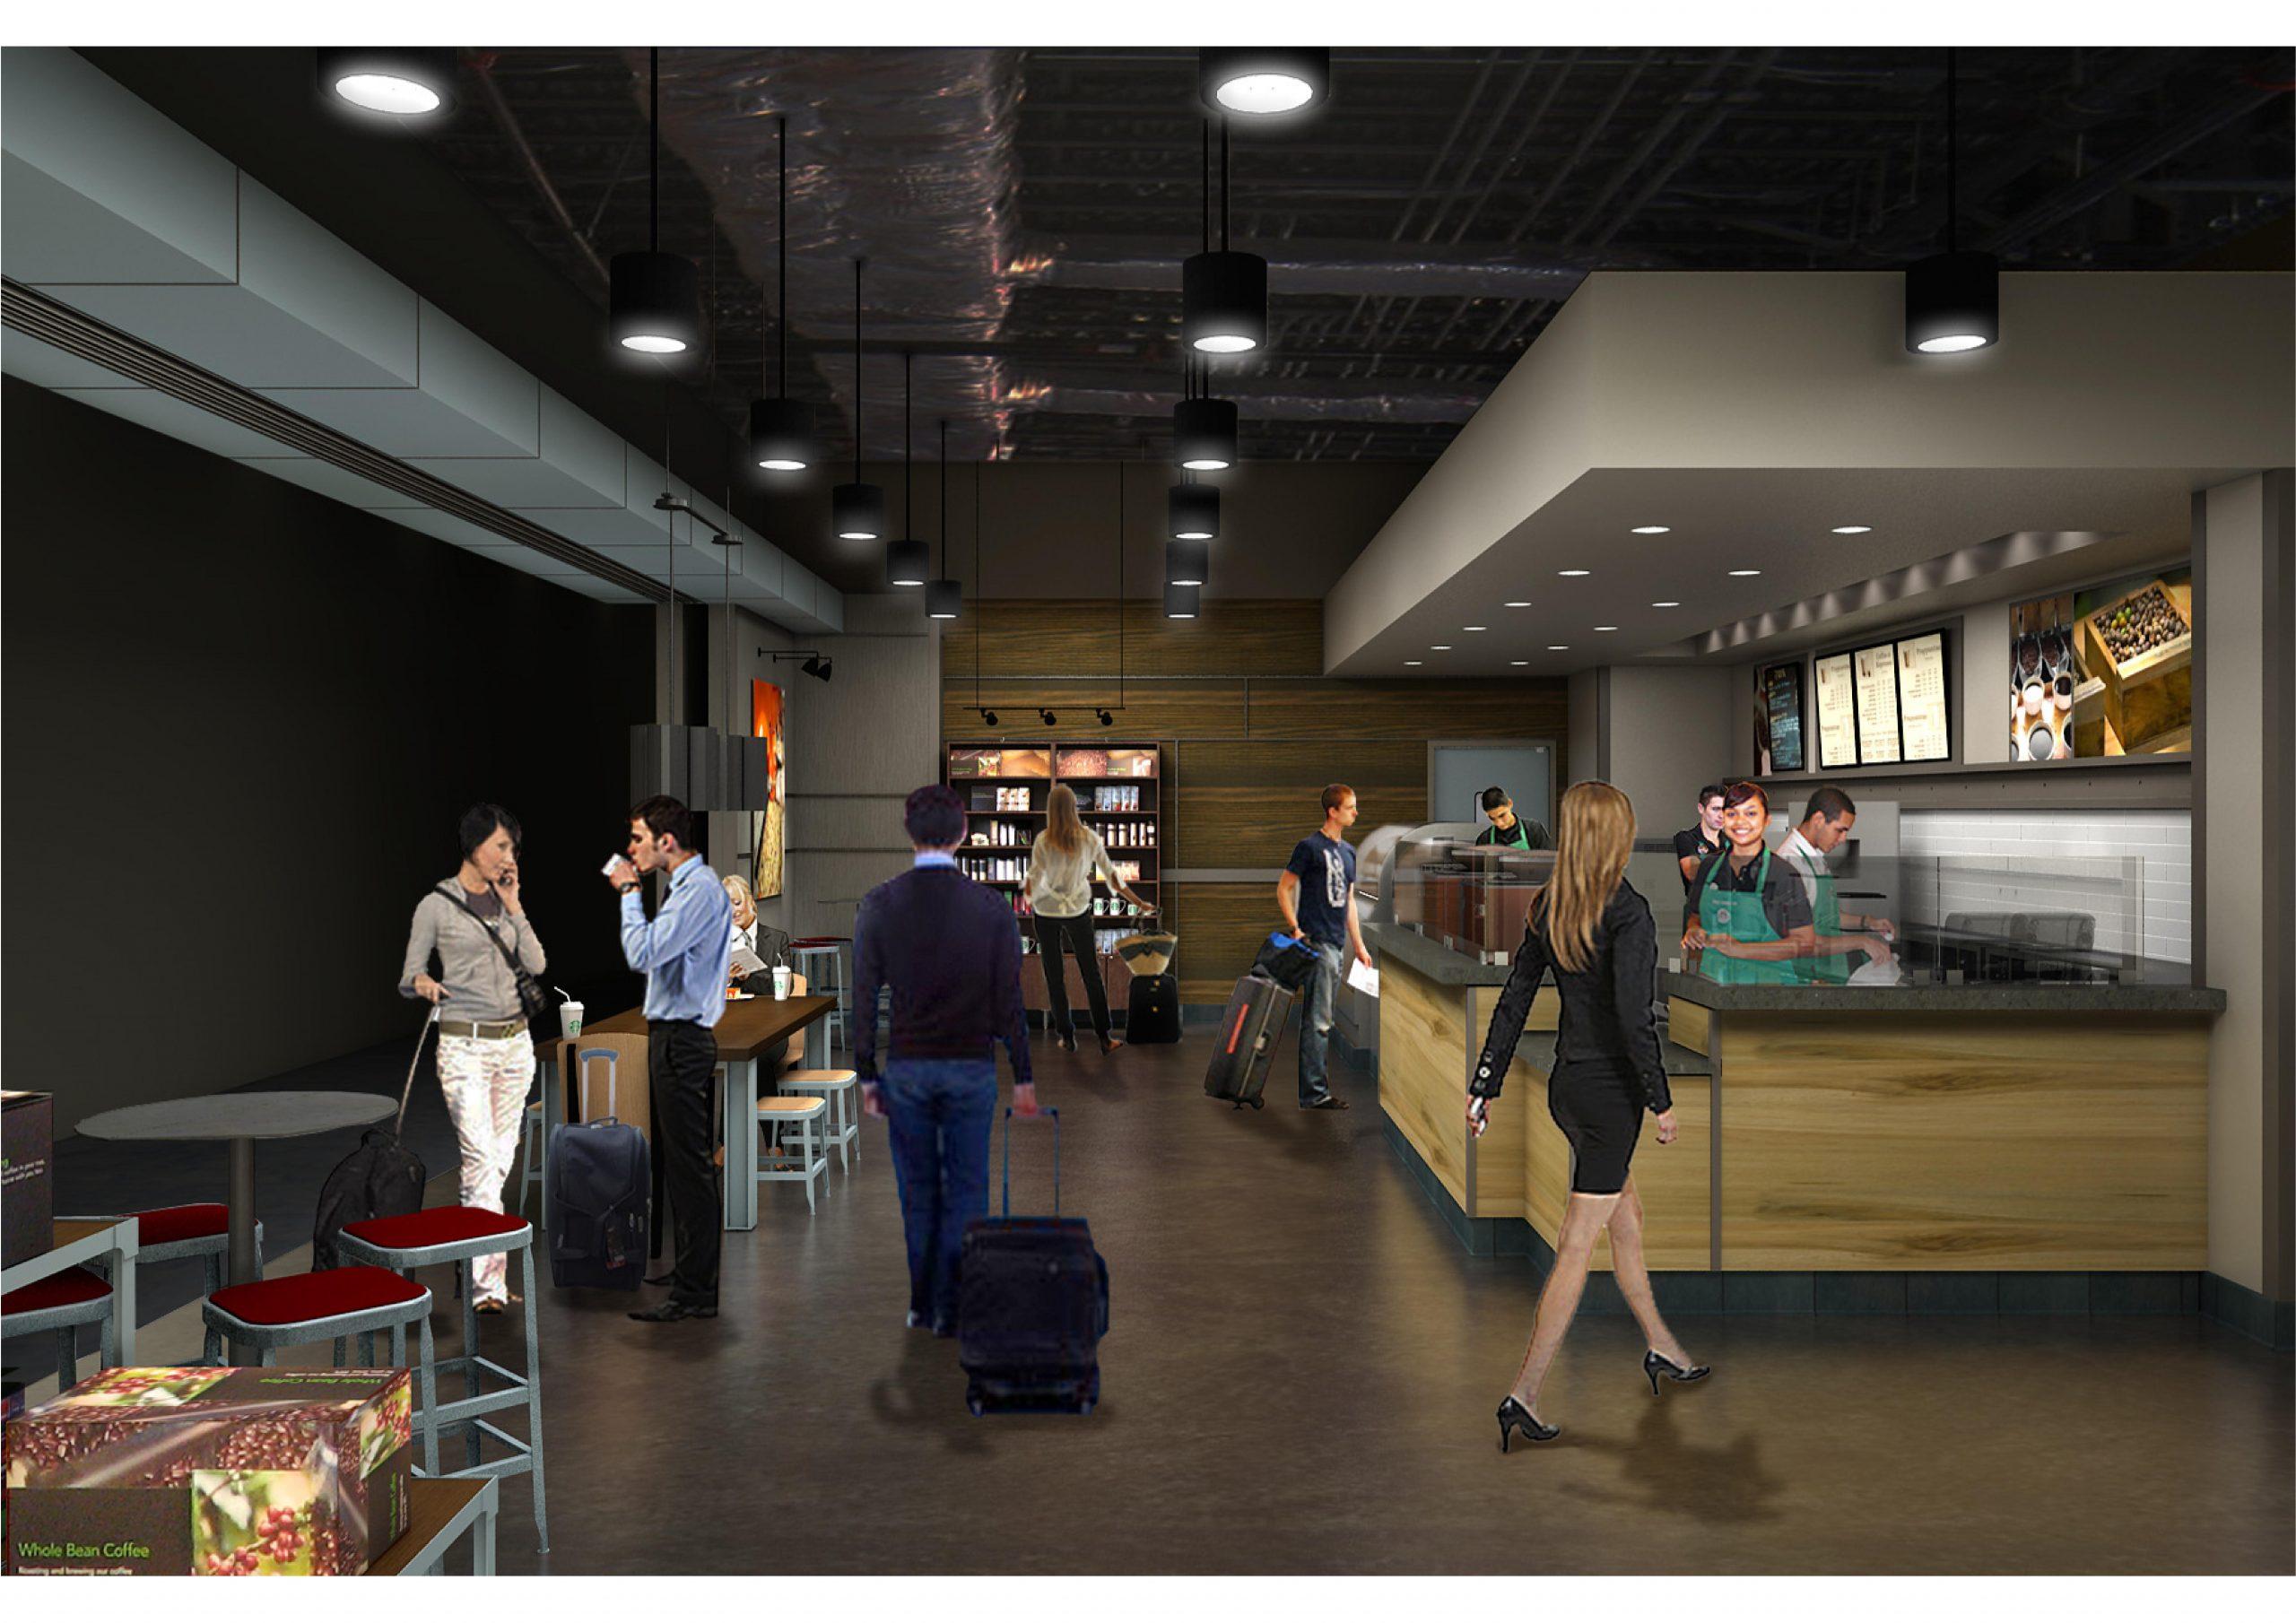 Starbucks Las Vegas International Airport Rendering 2